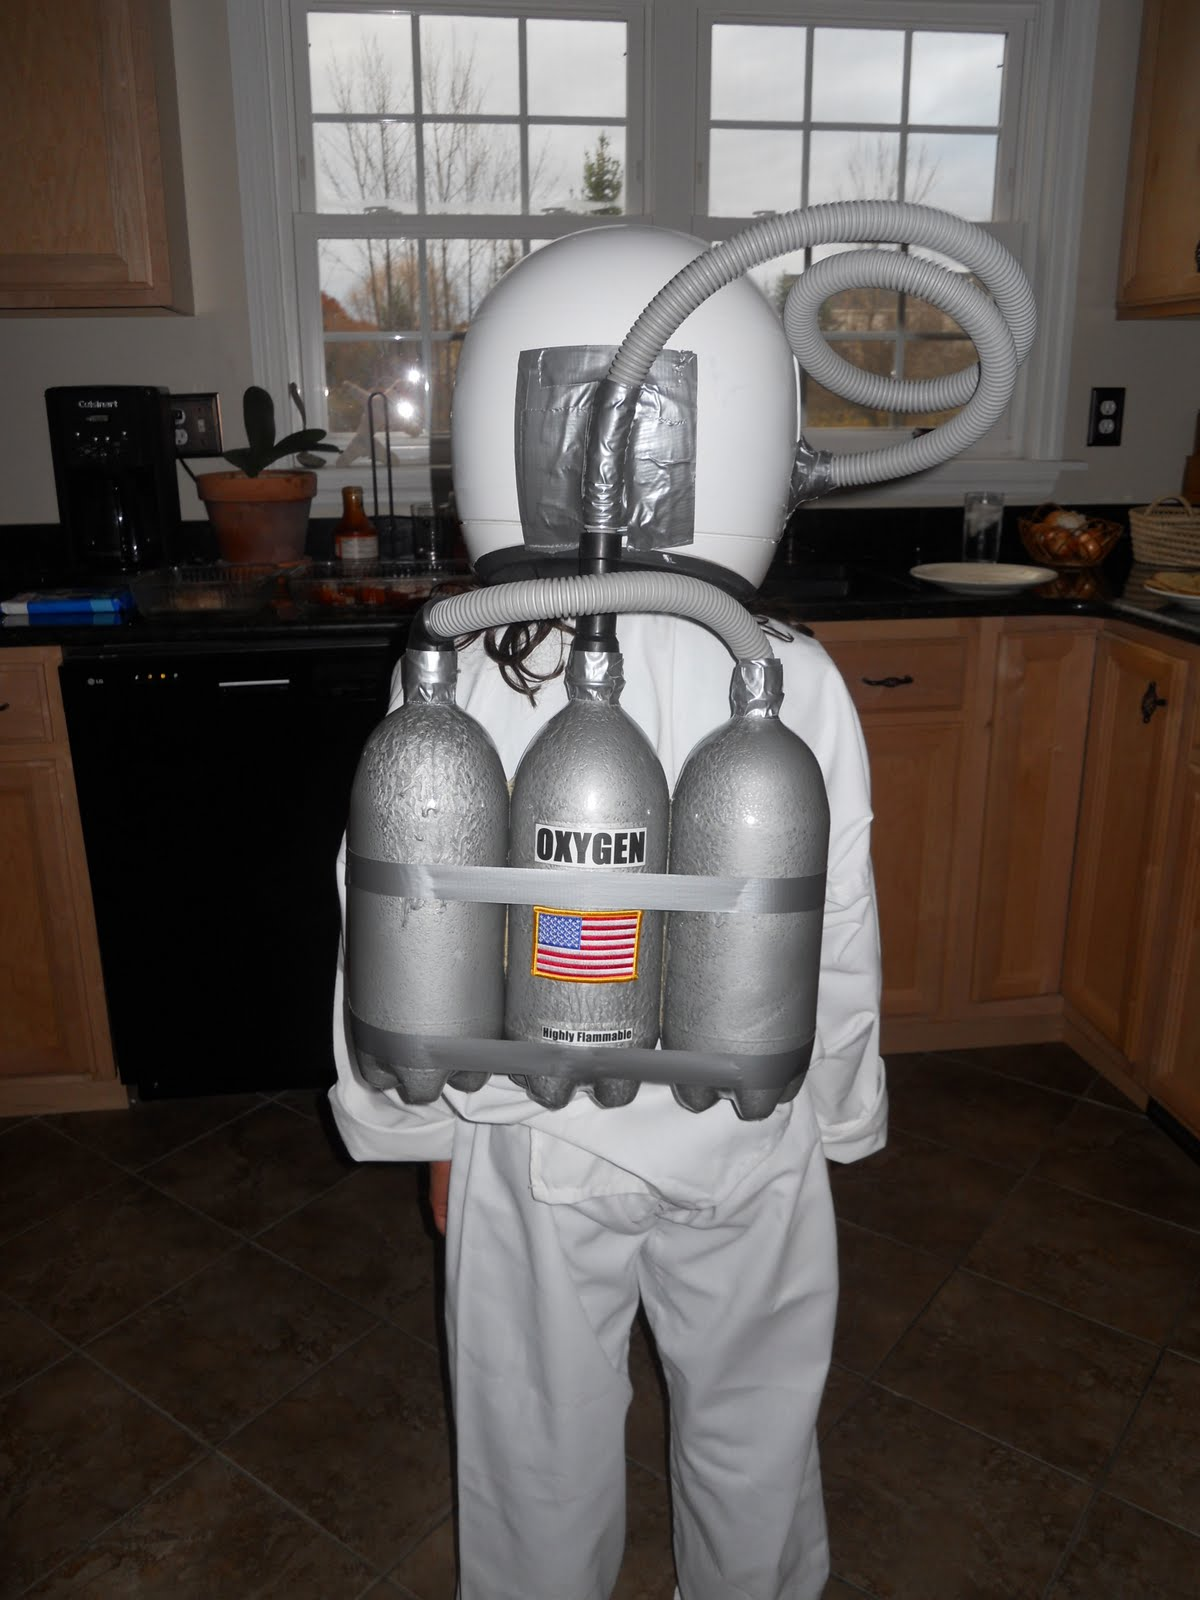 nasa spaceship oxygen tank - photo #23